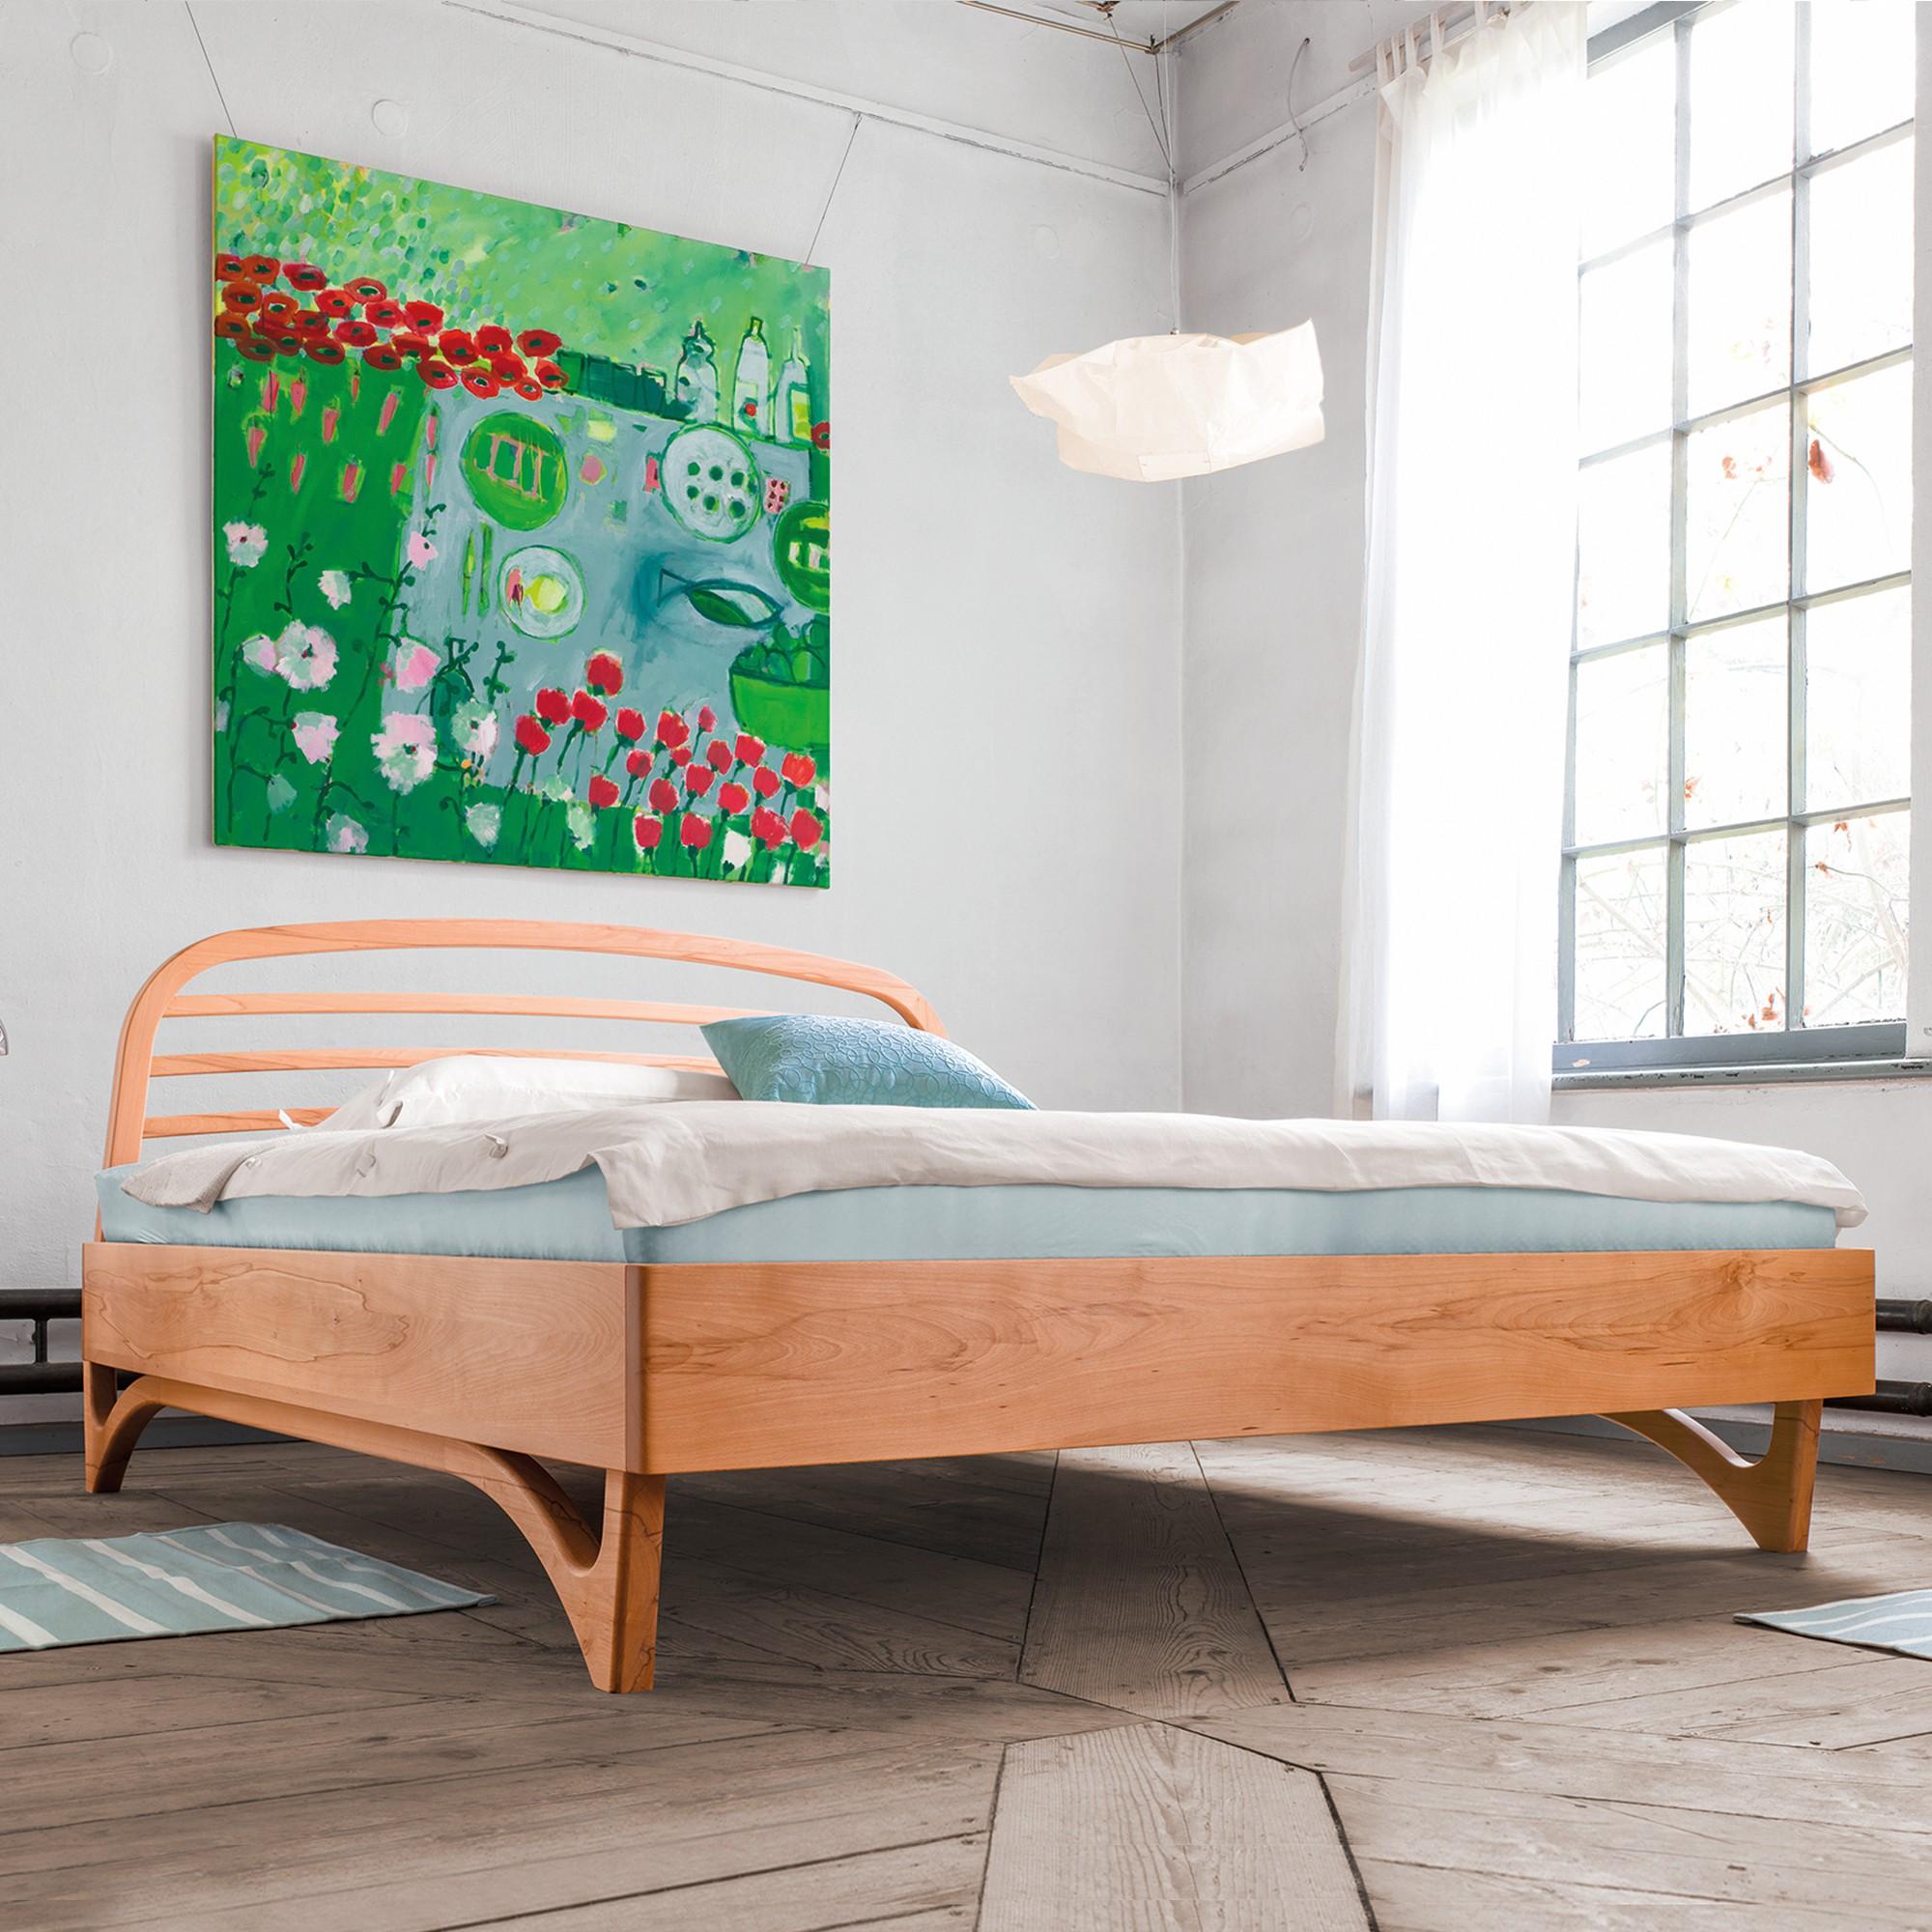 Full Size of Dormiente Massivholzbett Liv Online Kaufen Belama Bett Ausstellungsstück Ruf Betten Fabrikverkauf Amerikanisches Für Teenager Einfaches Hülsta 180x200 Bett Dormiente Bett